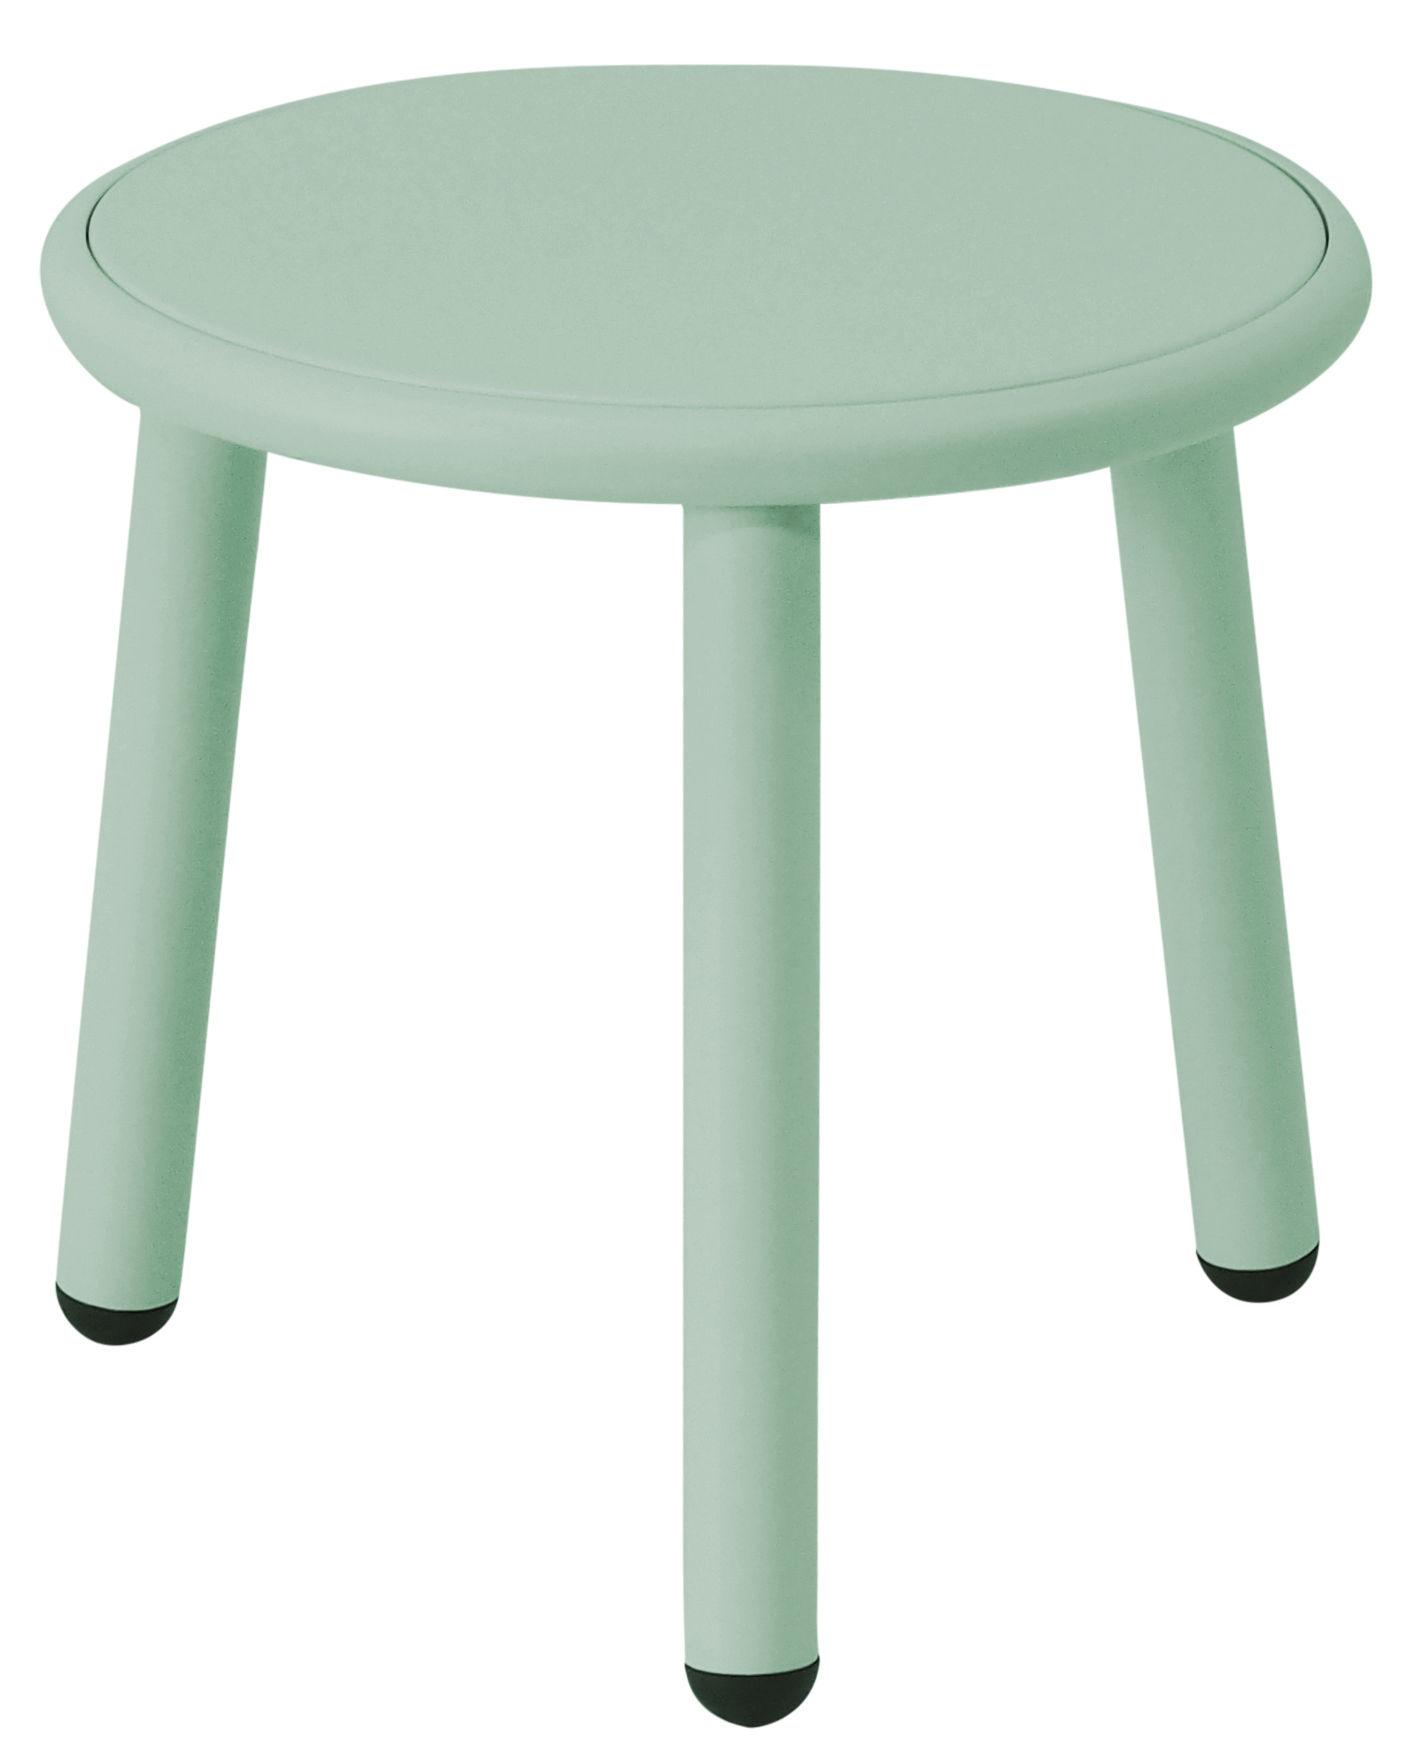 Mobilier - Tables basses - Table basse Yard / Ø 40 cm - Emu - Vert / Plateau vert - Aluminium verni